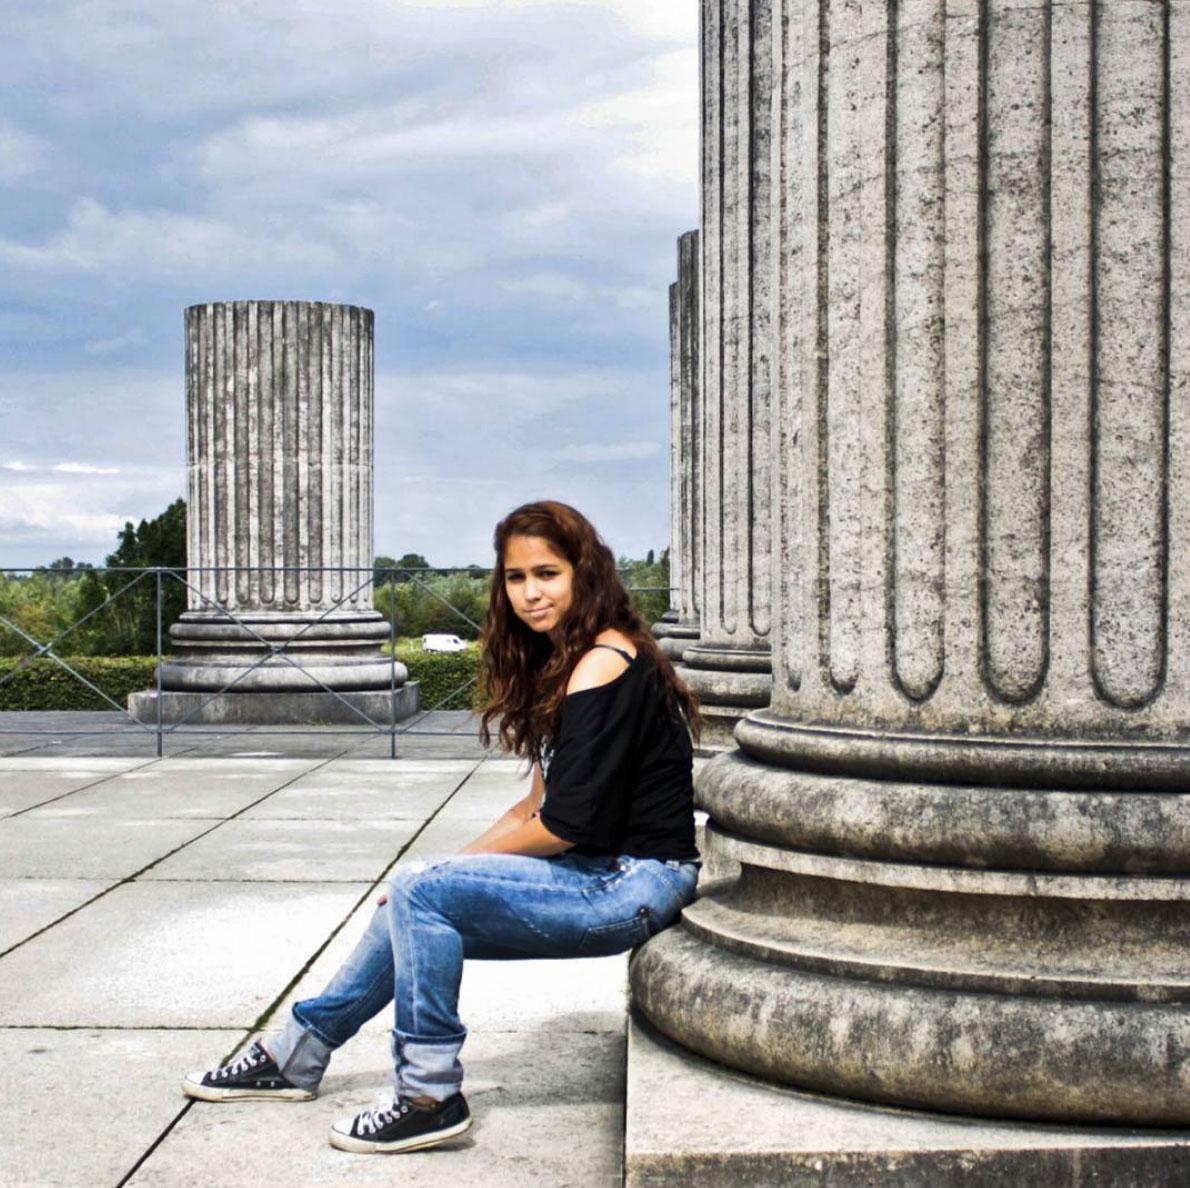 Selene at a roman column in xanten, germany